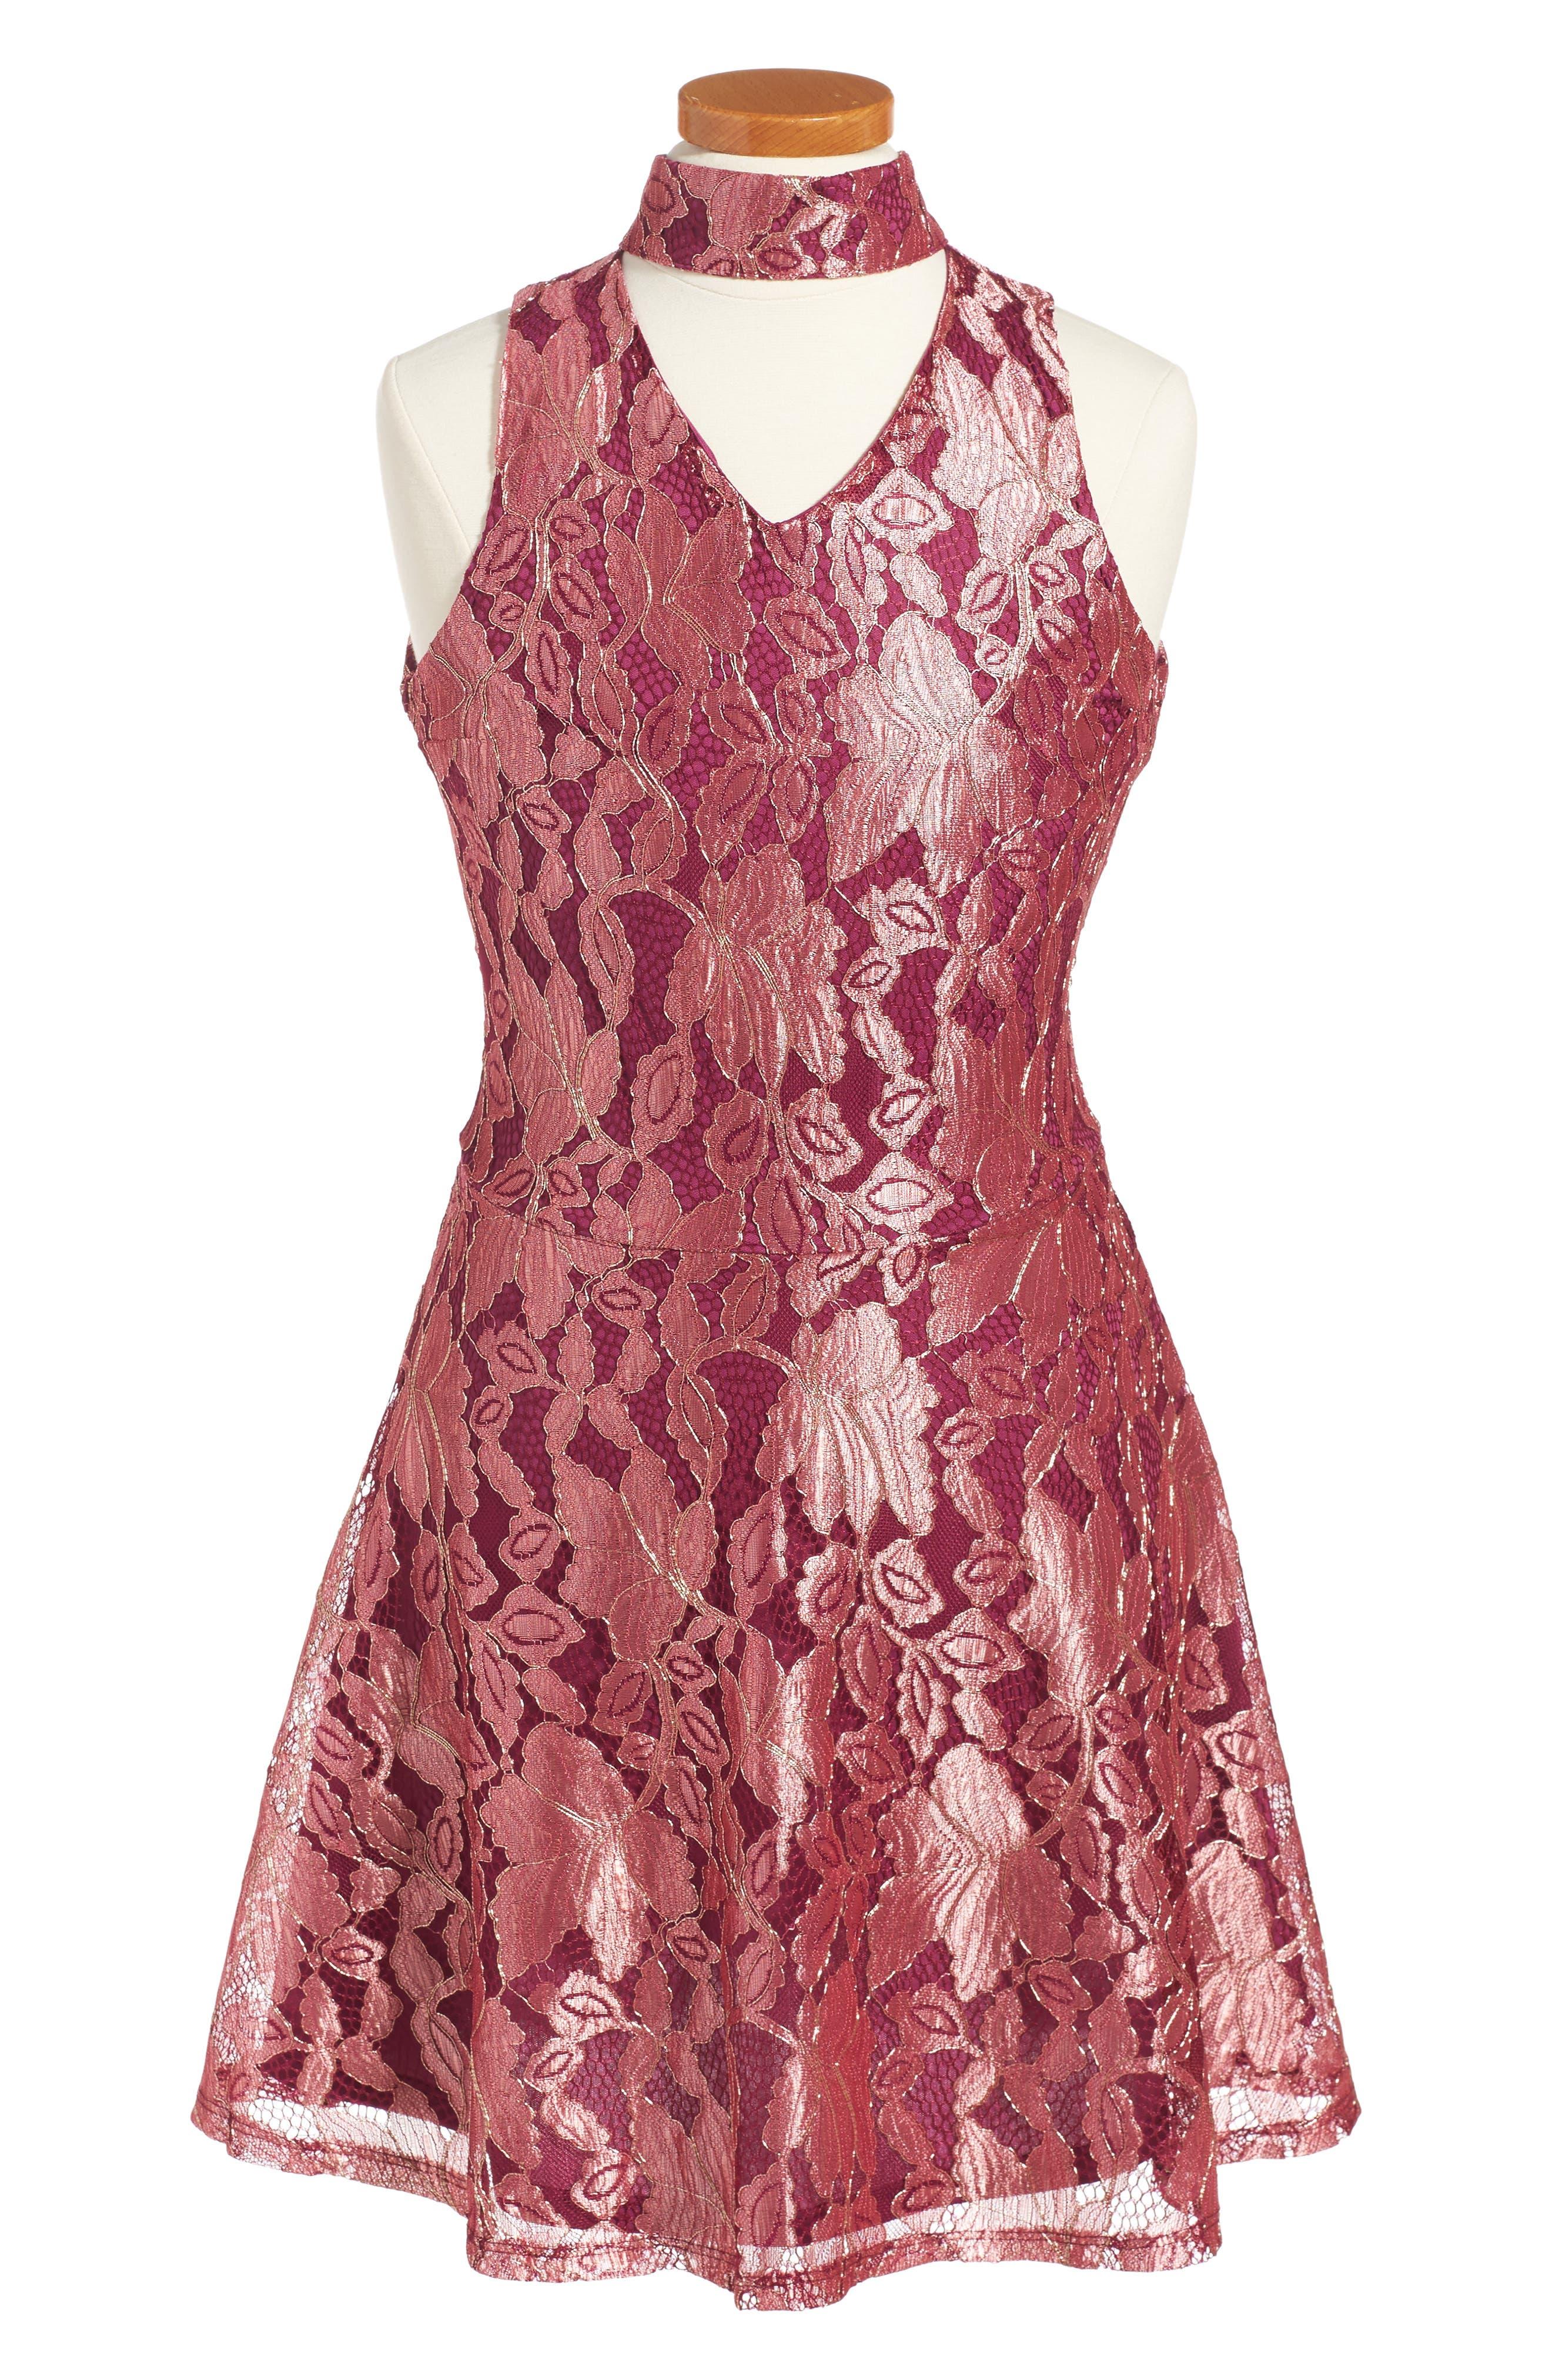 Main Image - Penelope Tree Ariana Lace Dress (Big Girls)